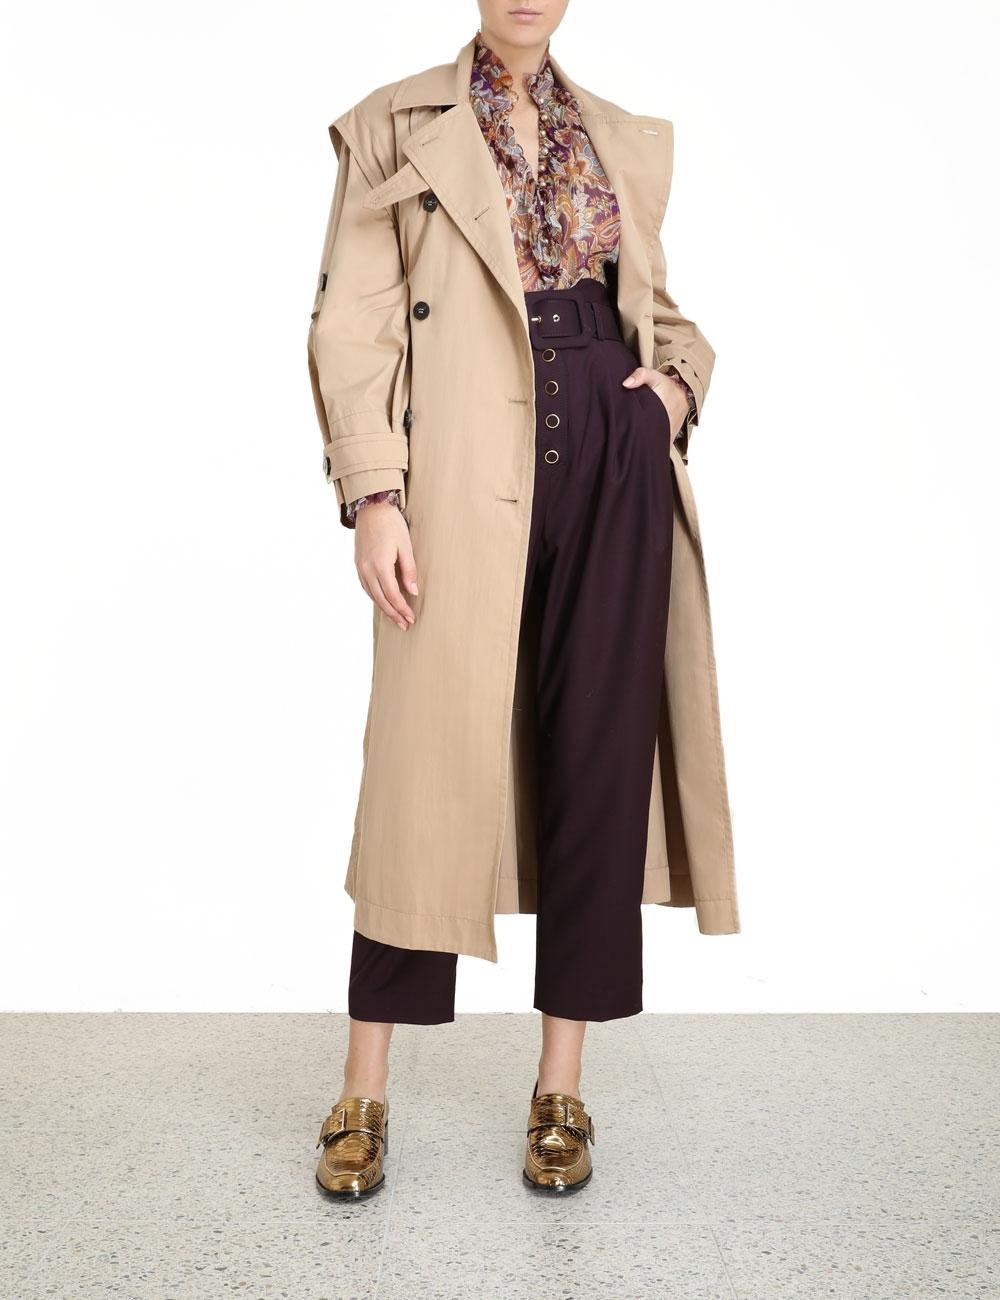 Ladybeetle Trench Coat